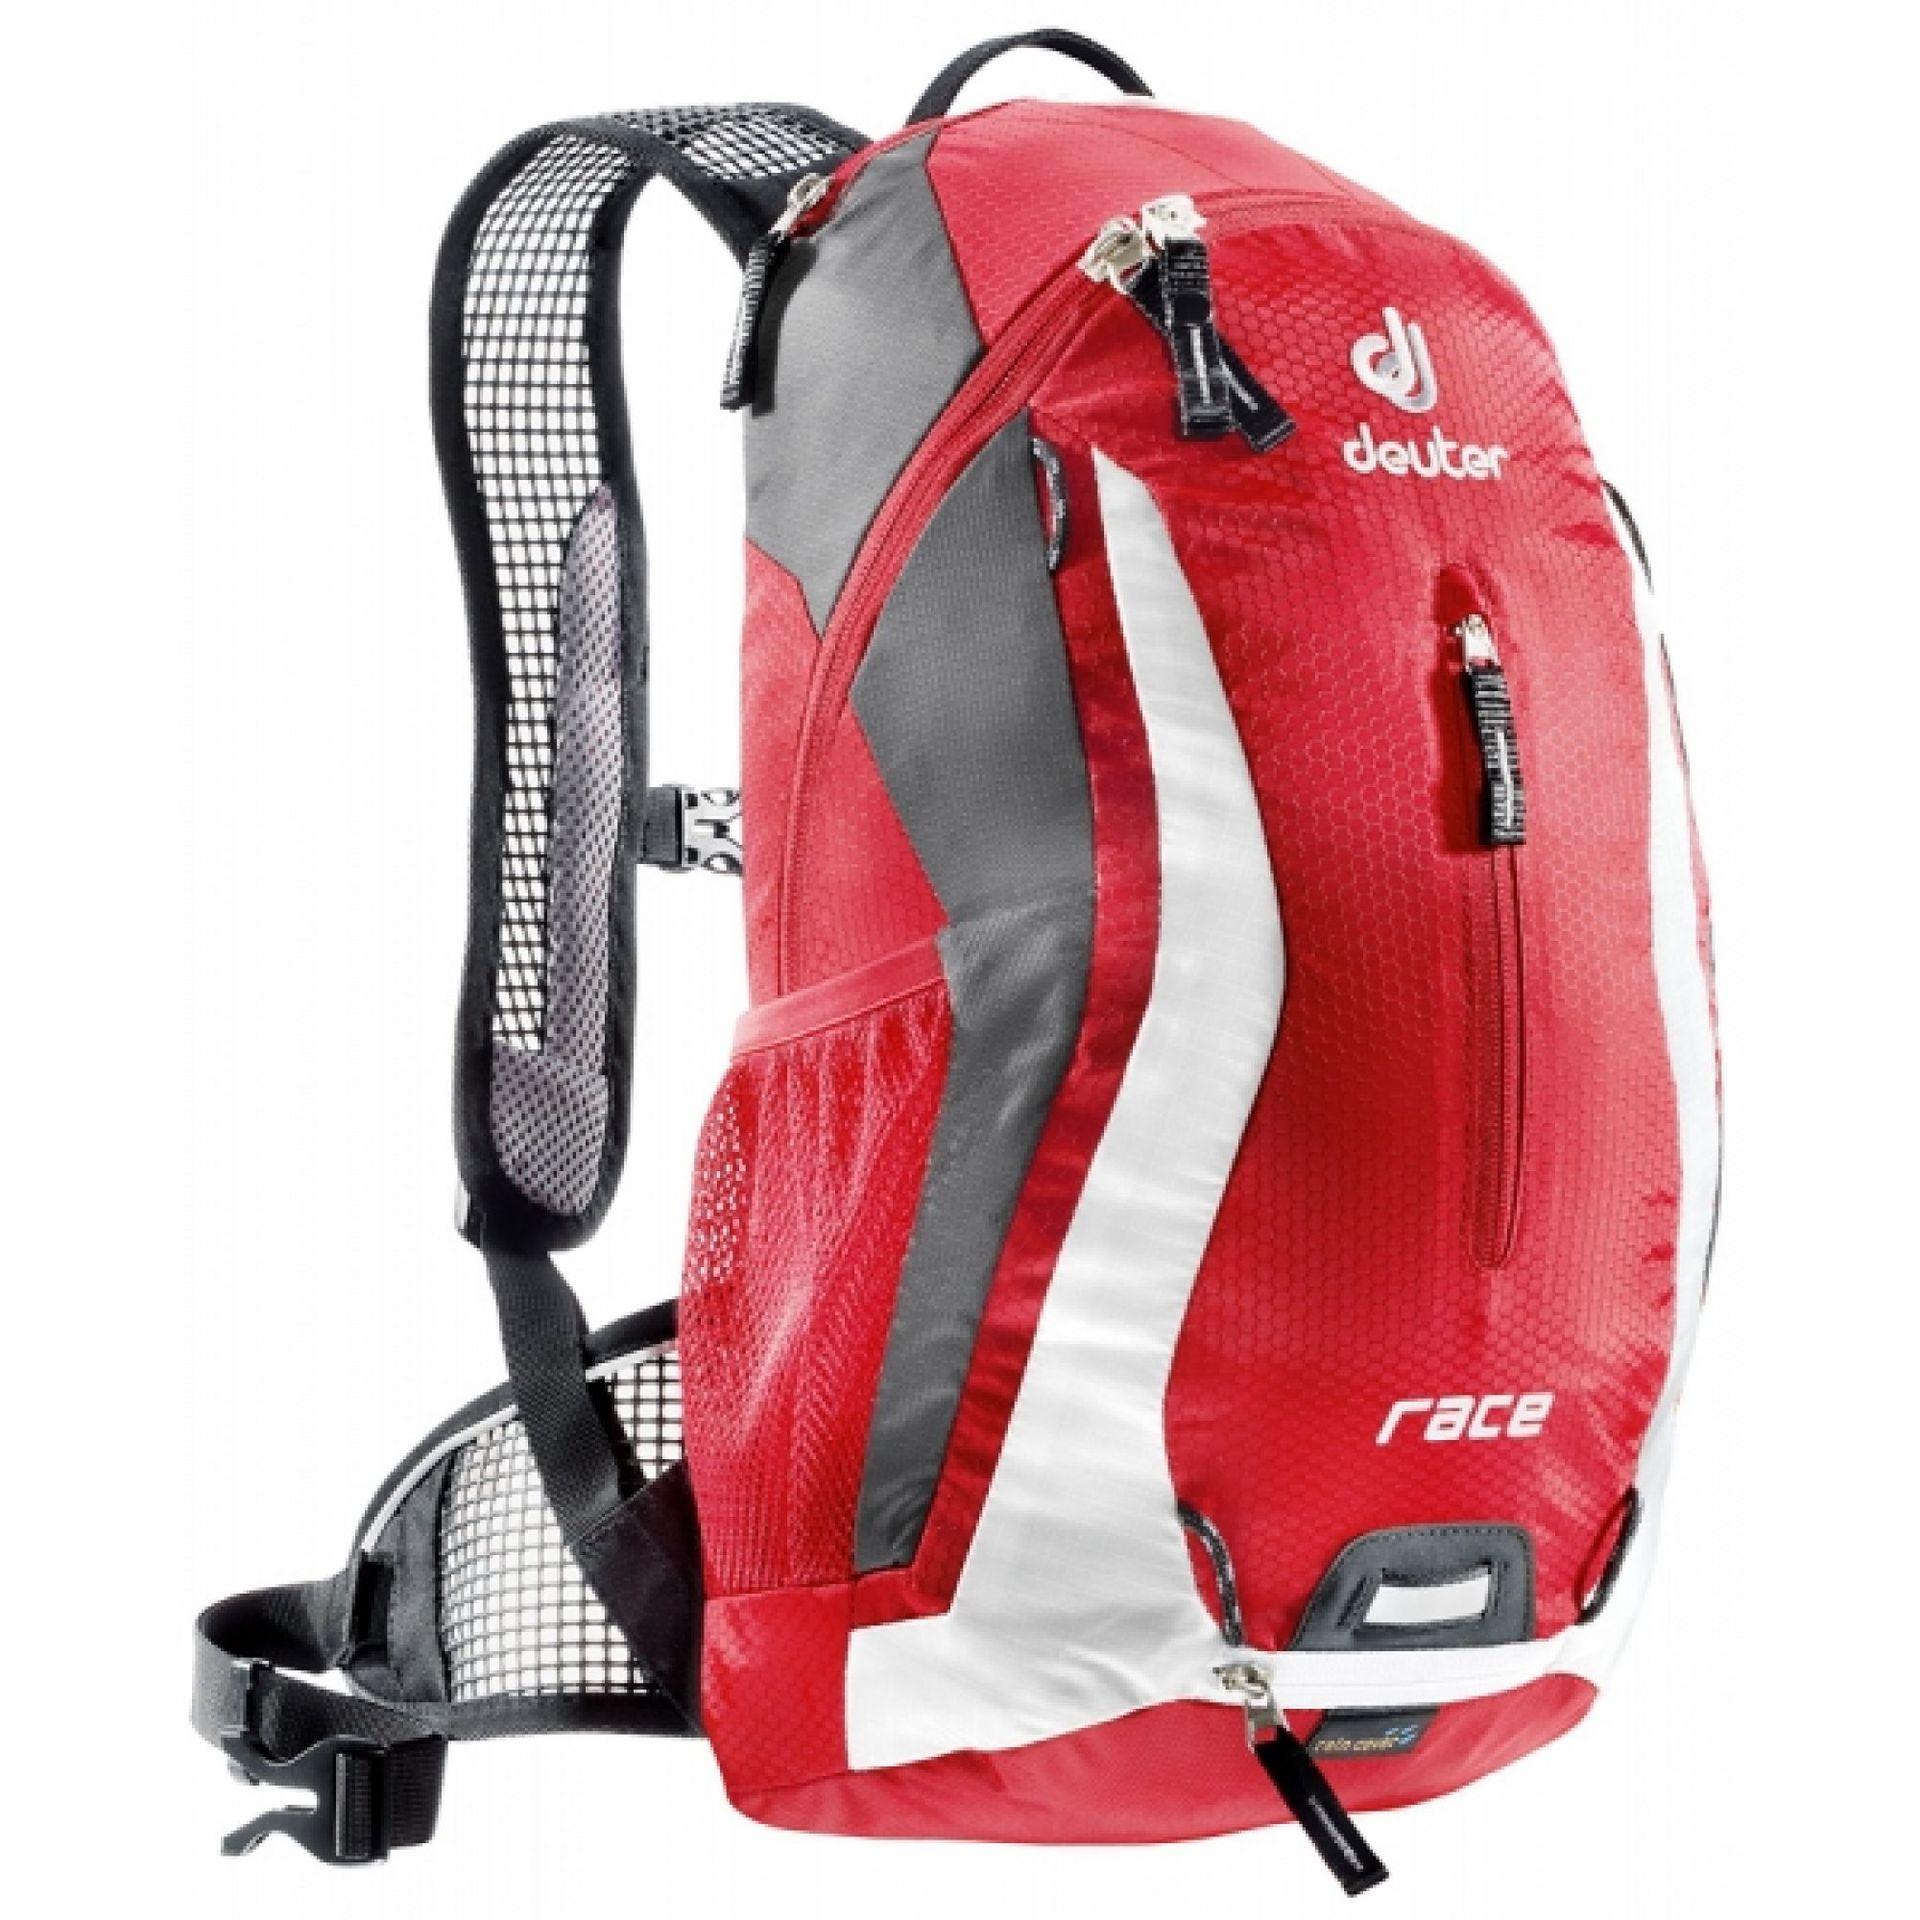 Plecak Deuter Race czerwono biały